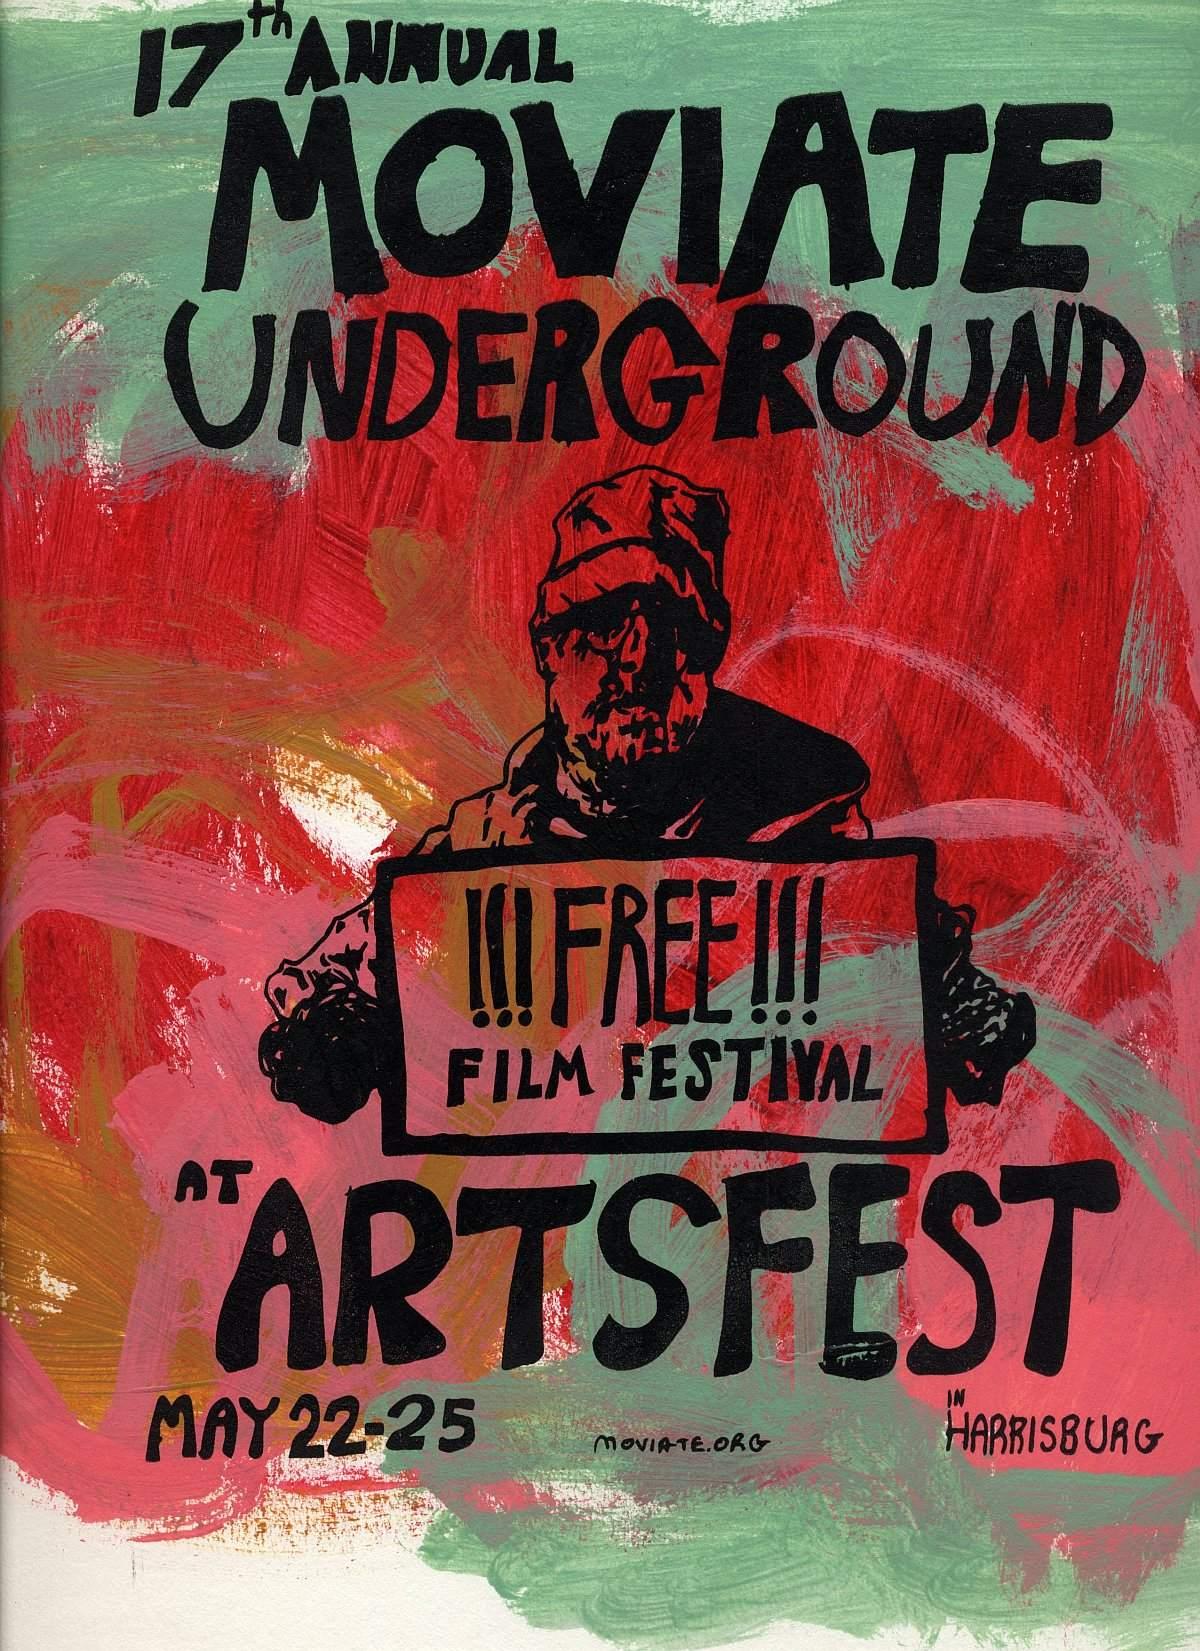 Artsfest_Film_Festival_2015_Color_Poster_1200px